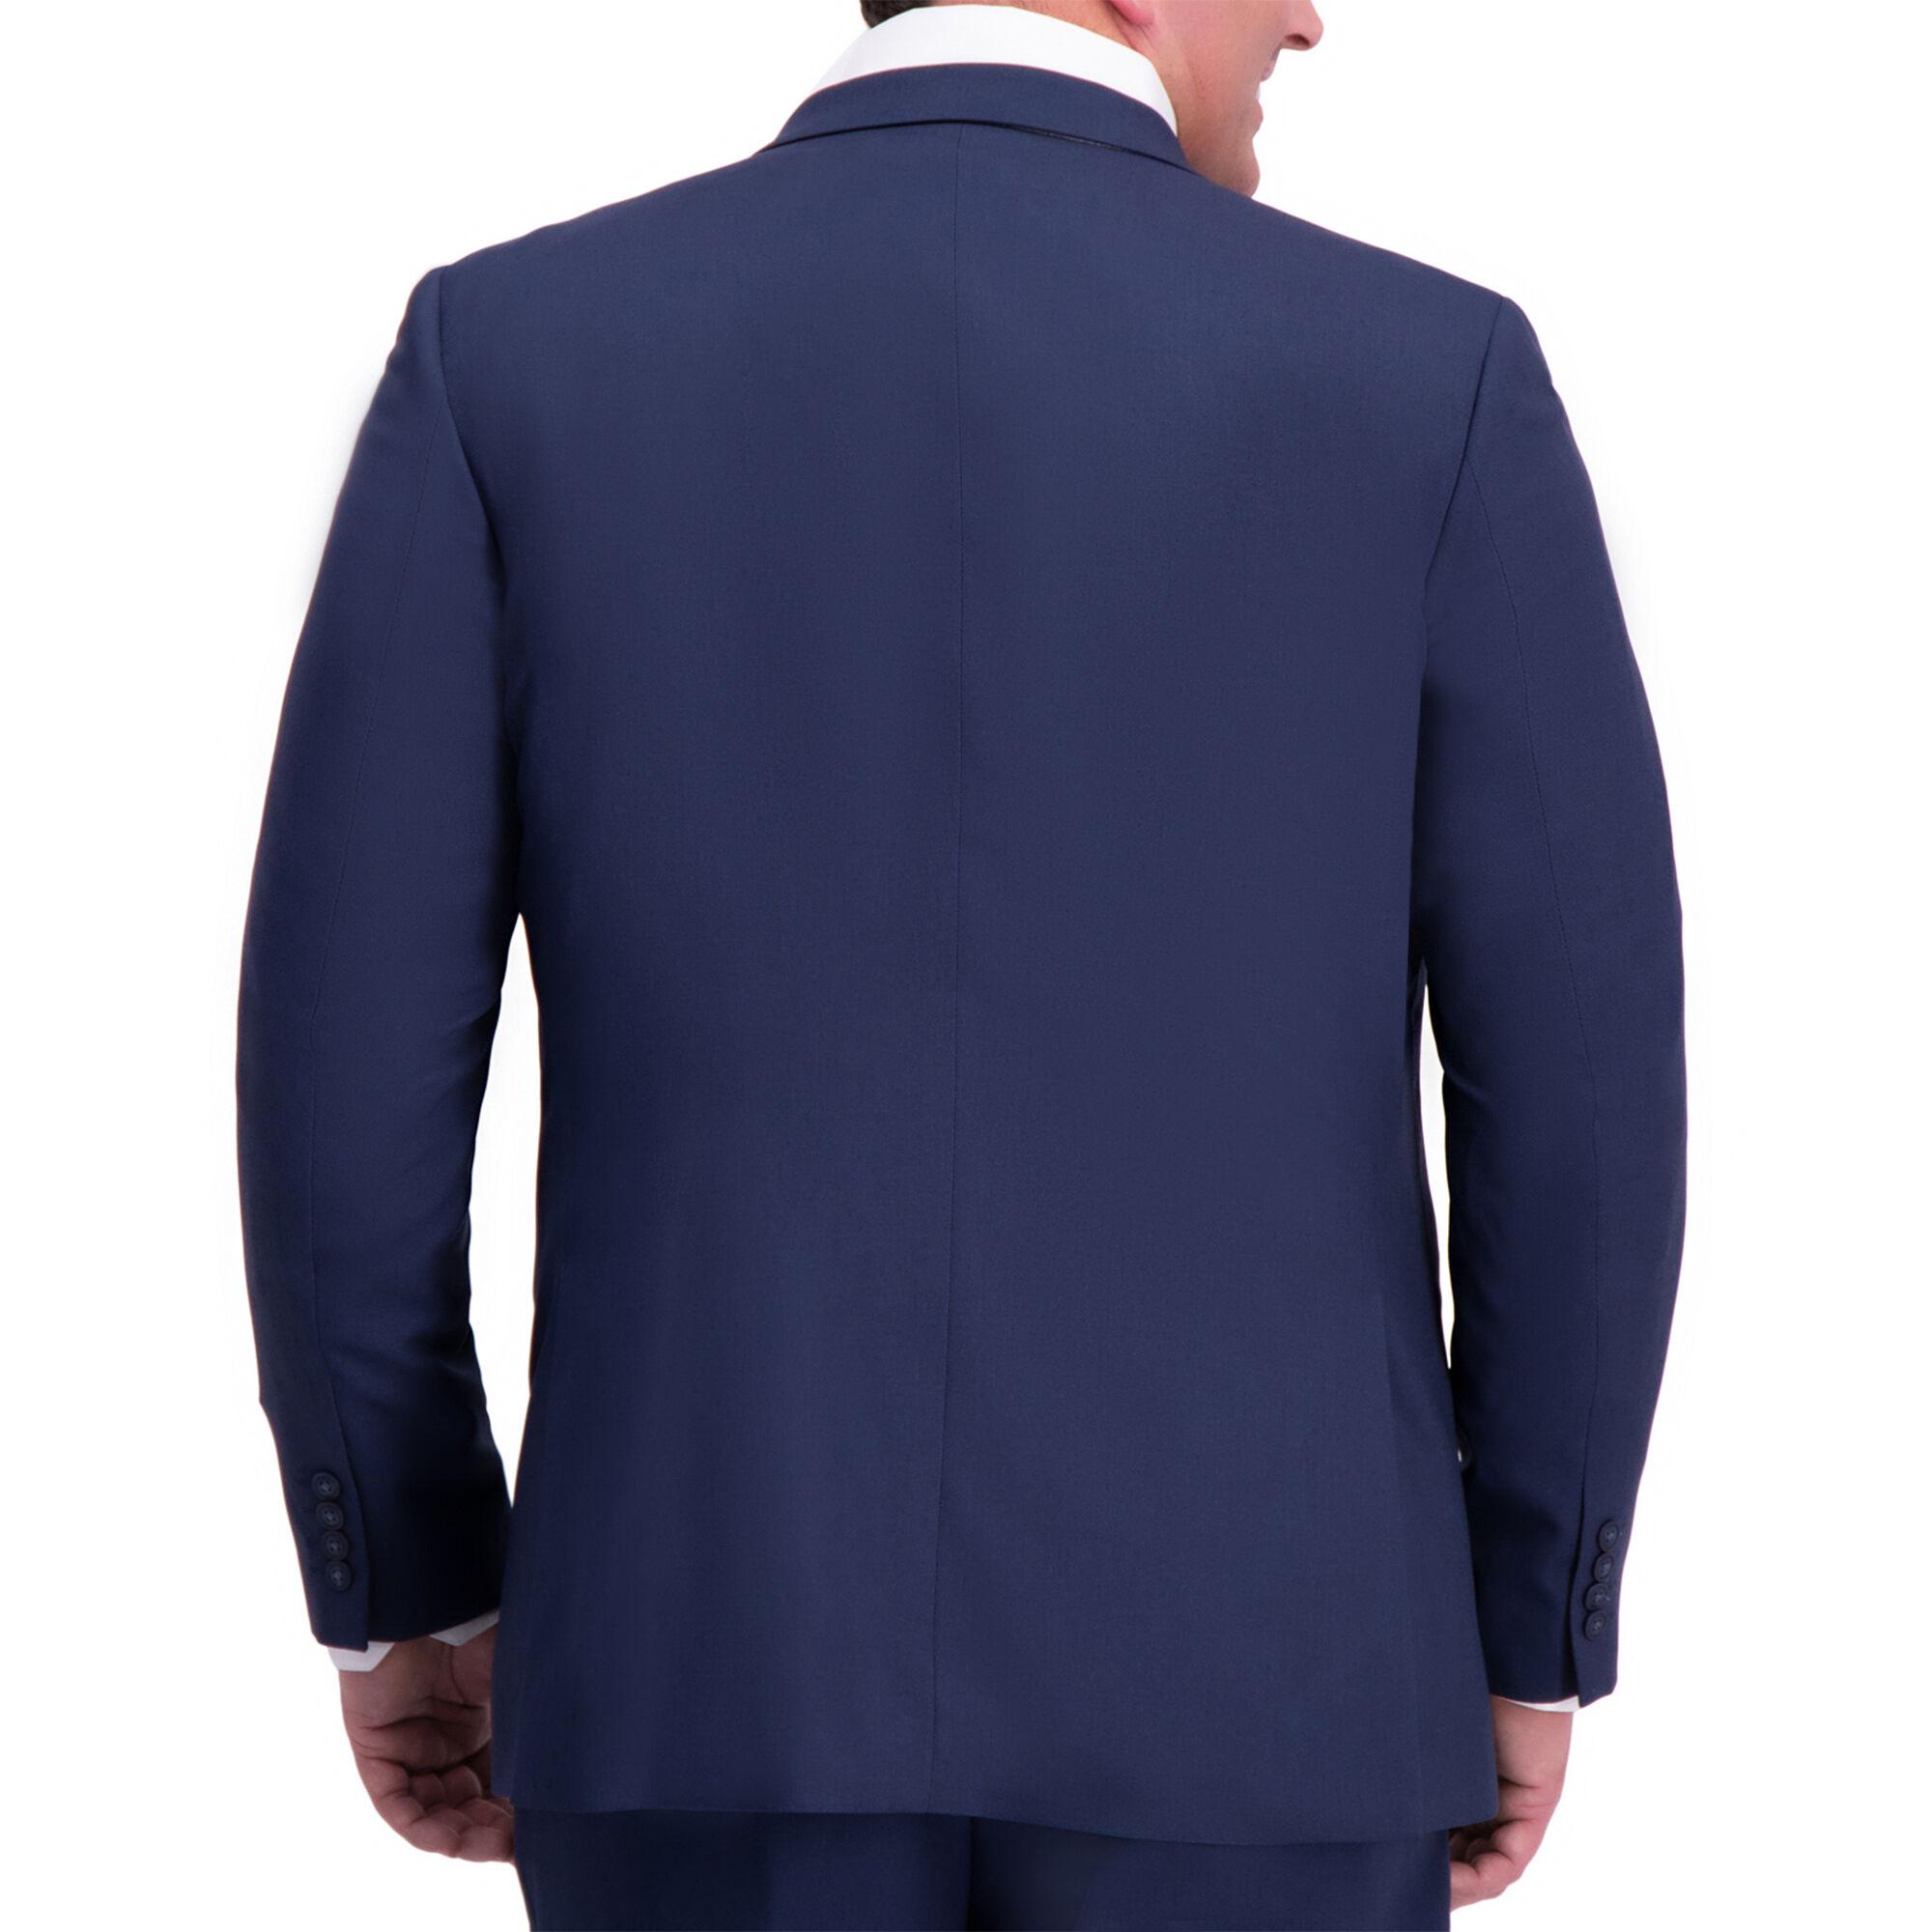 dfbf4eea47 ... Big  amp  Tall Travel Performance Suit Jacket